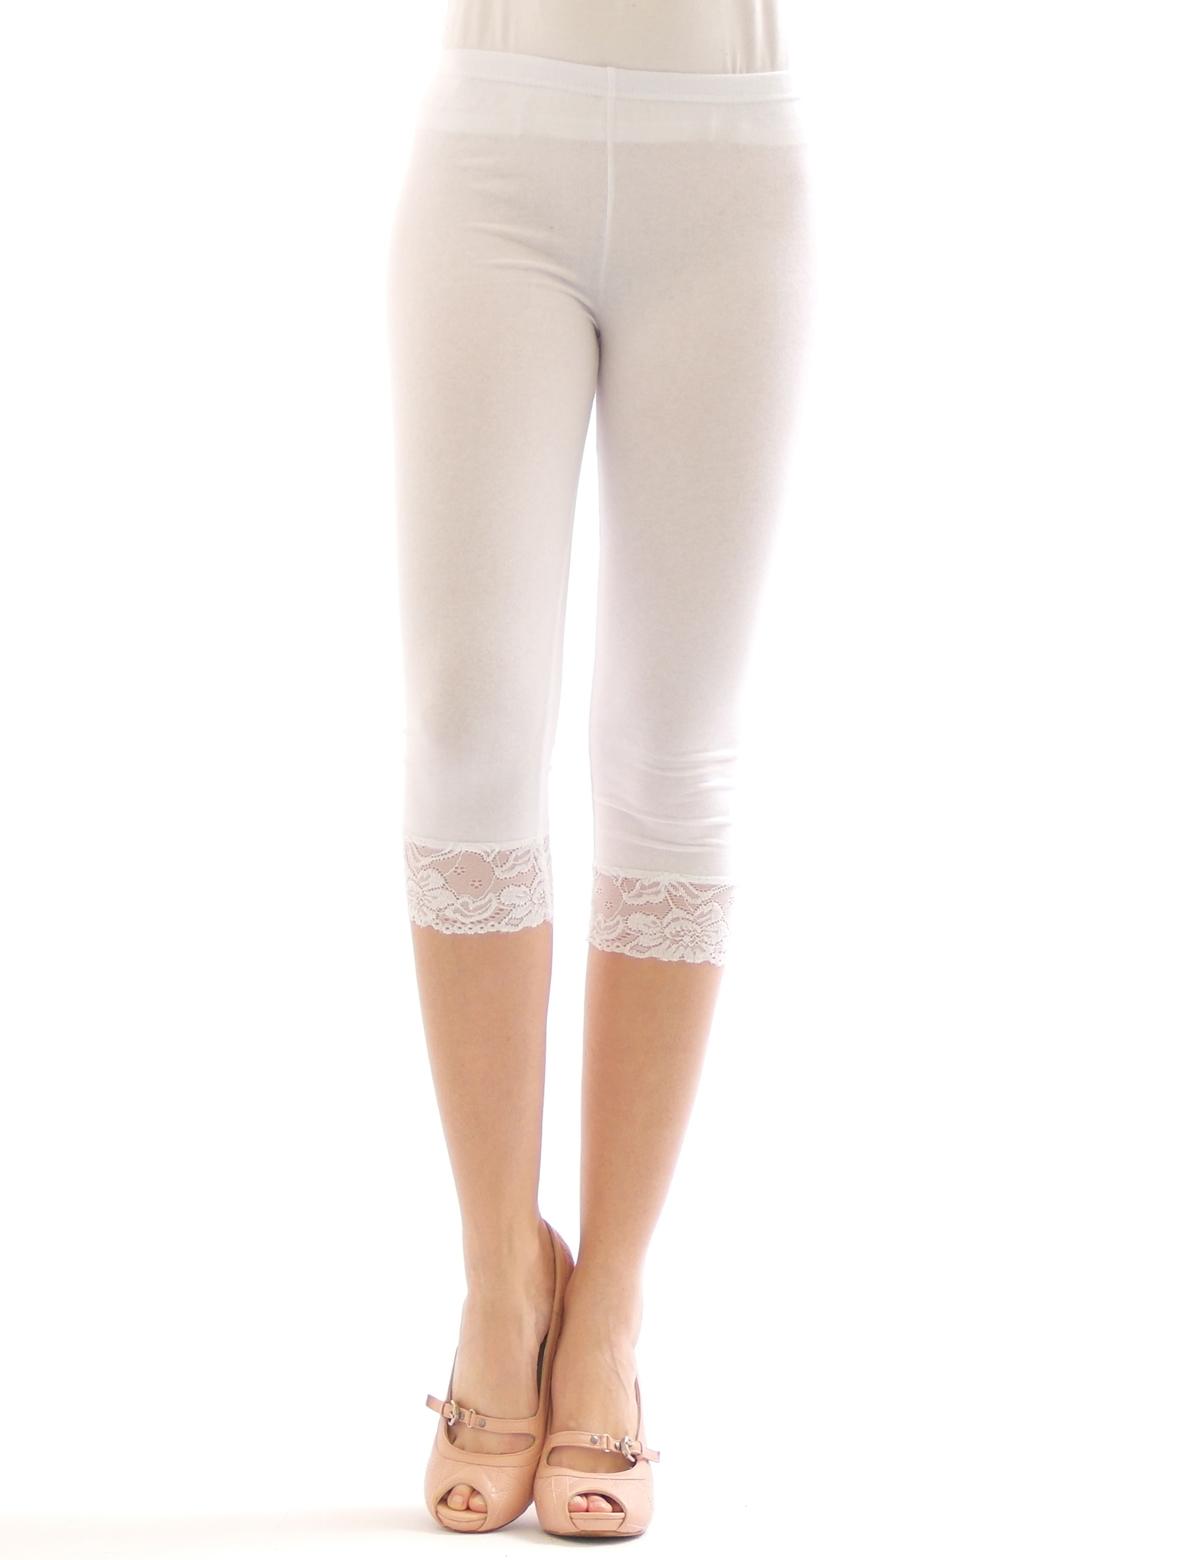 capri 3 4 leggings spitze leggins hauteng baumwolle damen. Black Bedroom Furniture Sets. Home Design Ideas